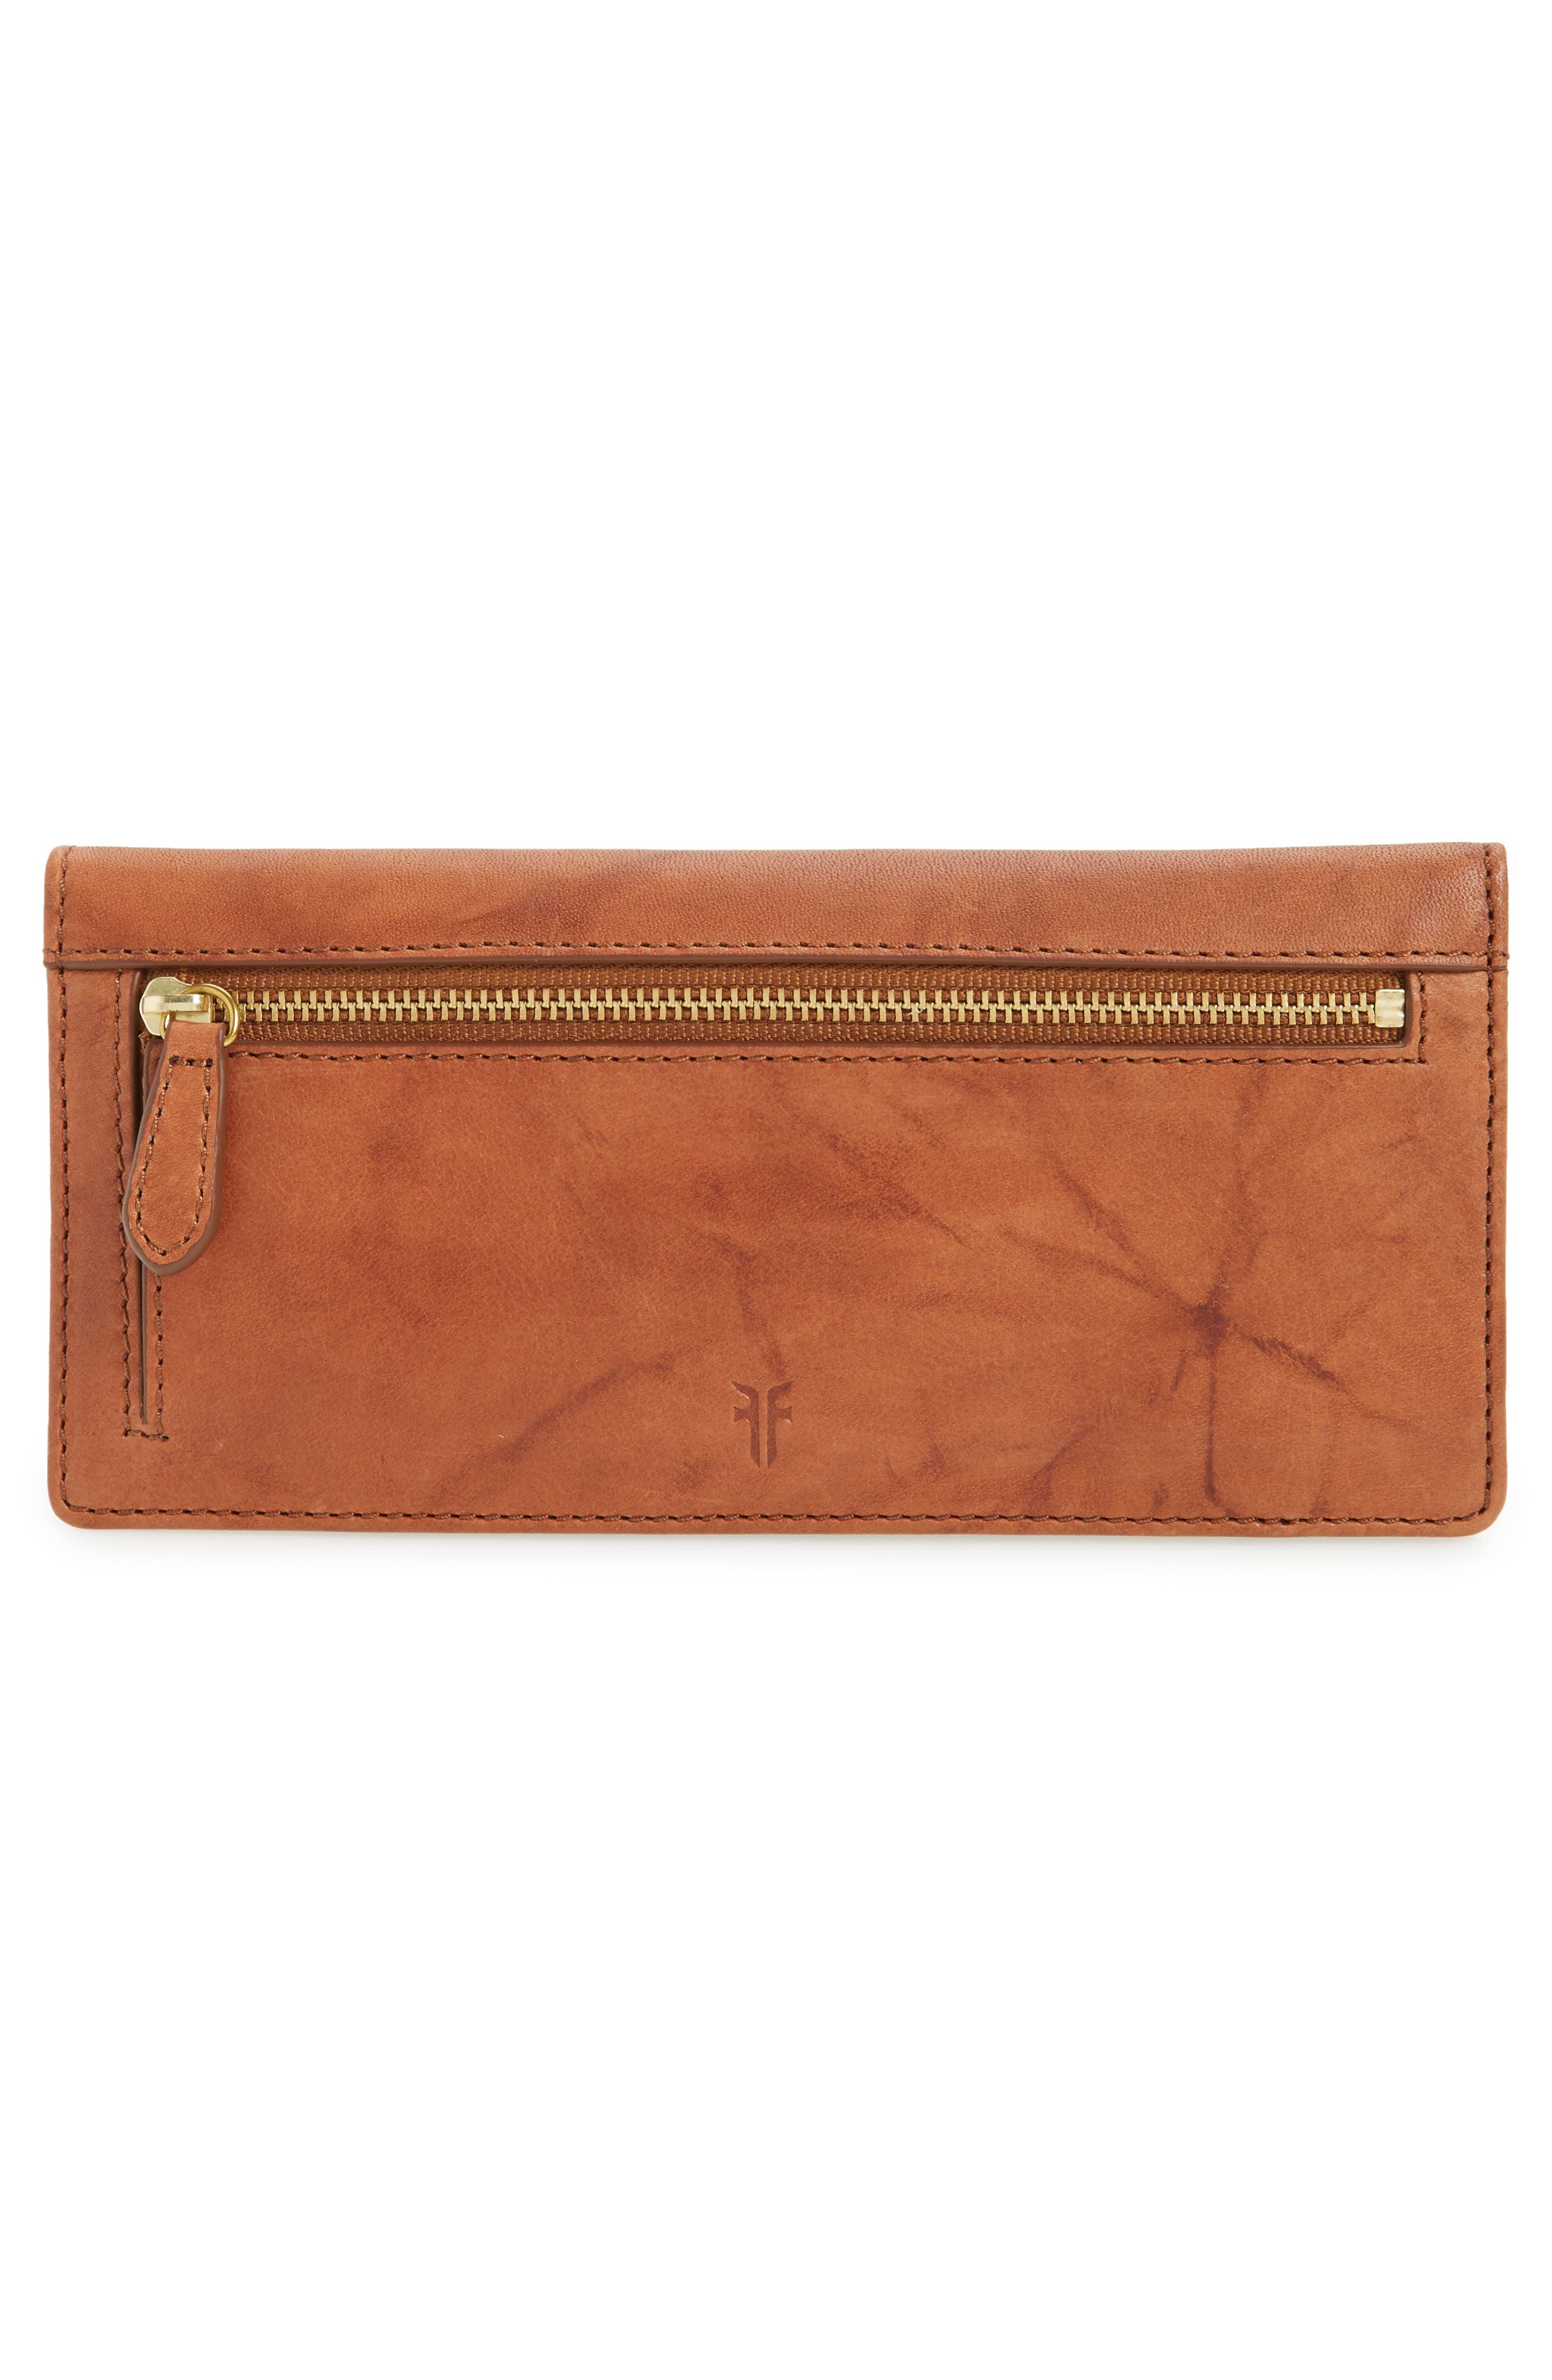 Campus Rivet Slim Leather Wallet,                             Alternate thumbnail 4, color,                             Saddle